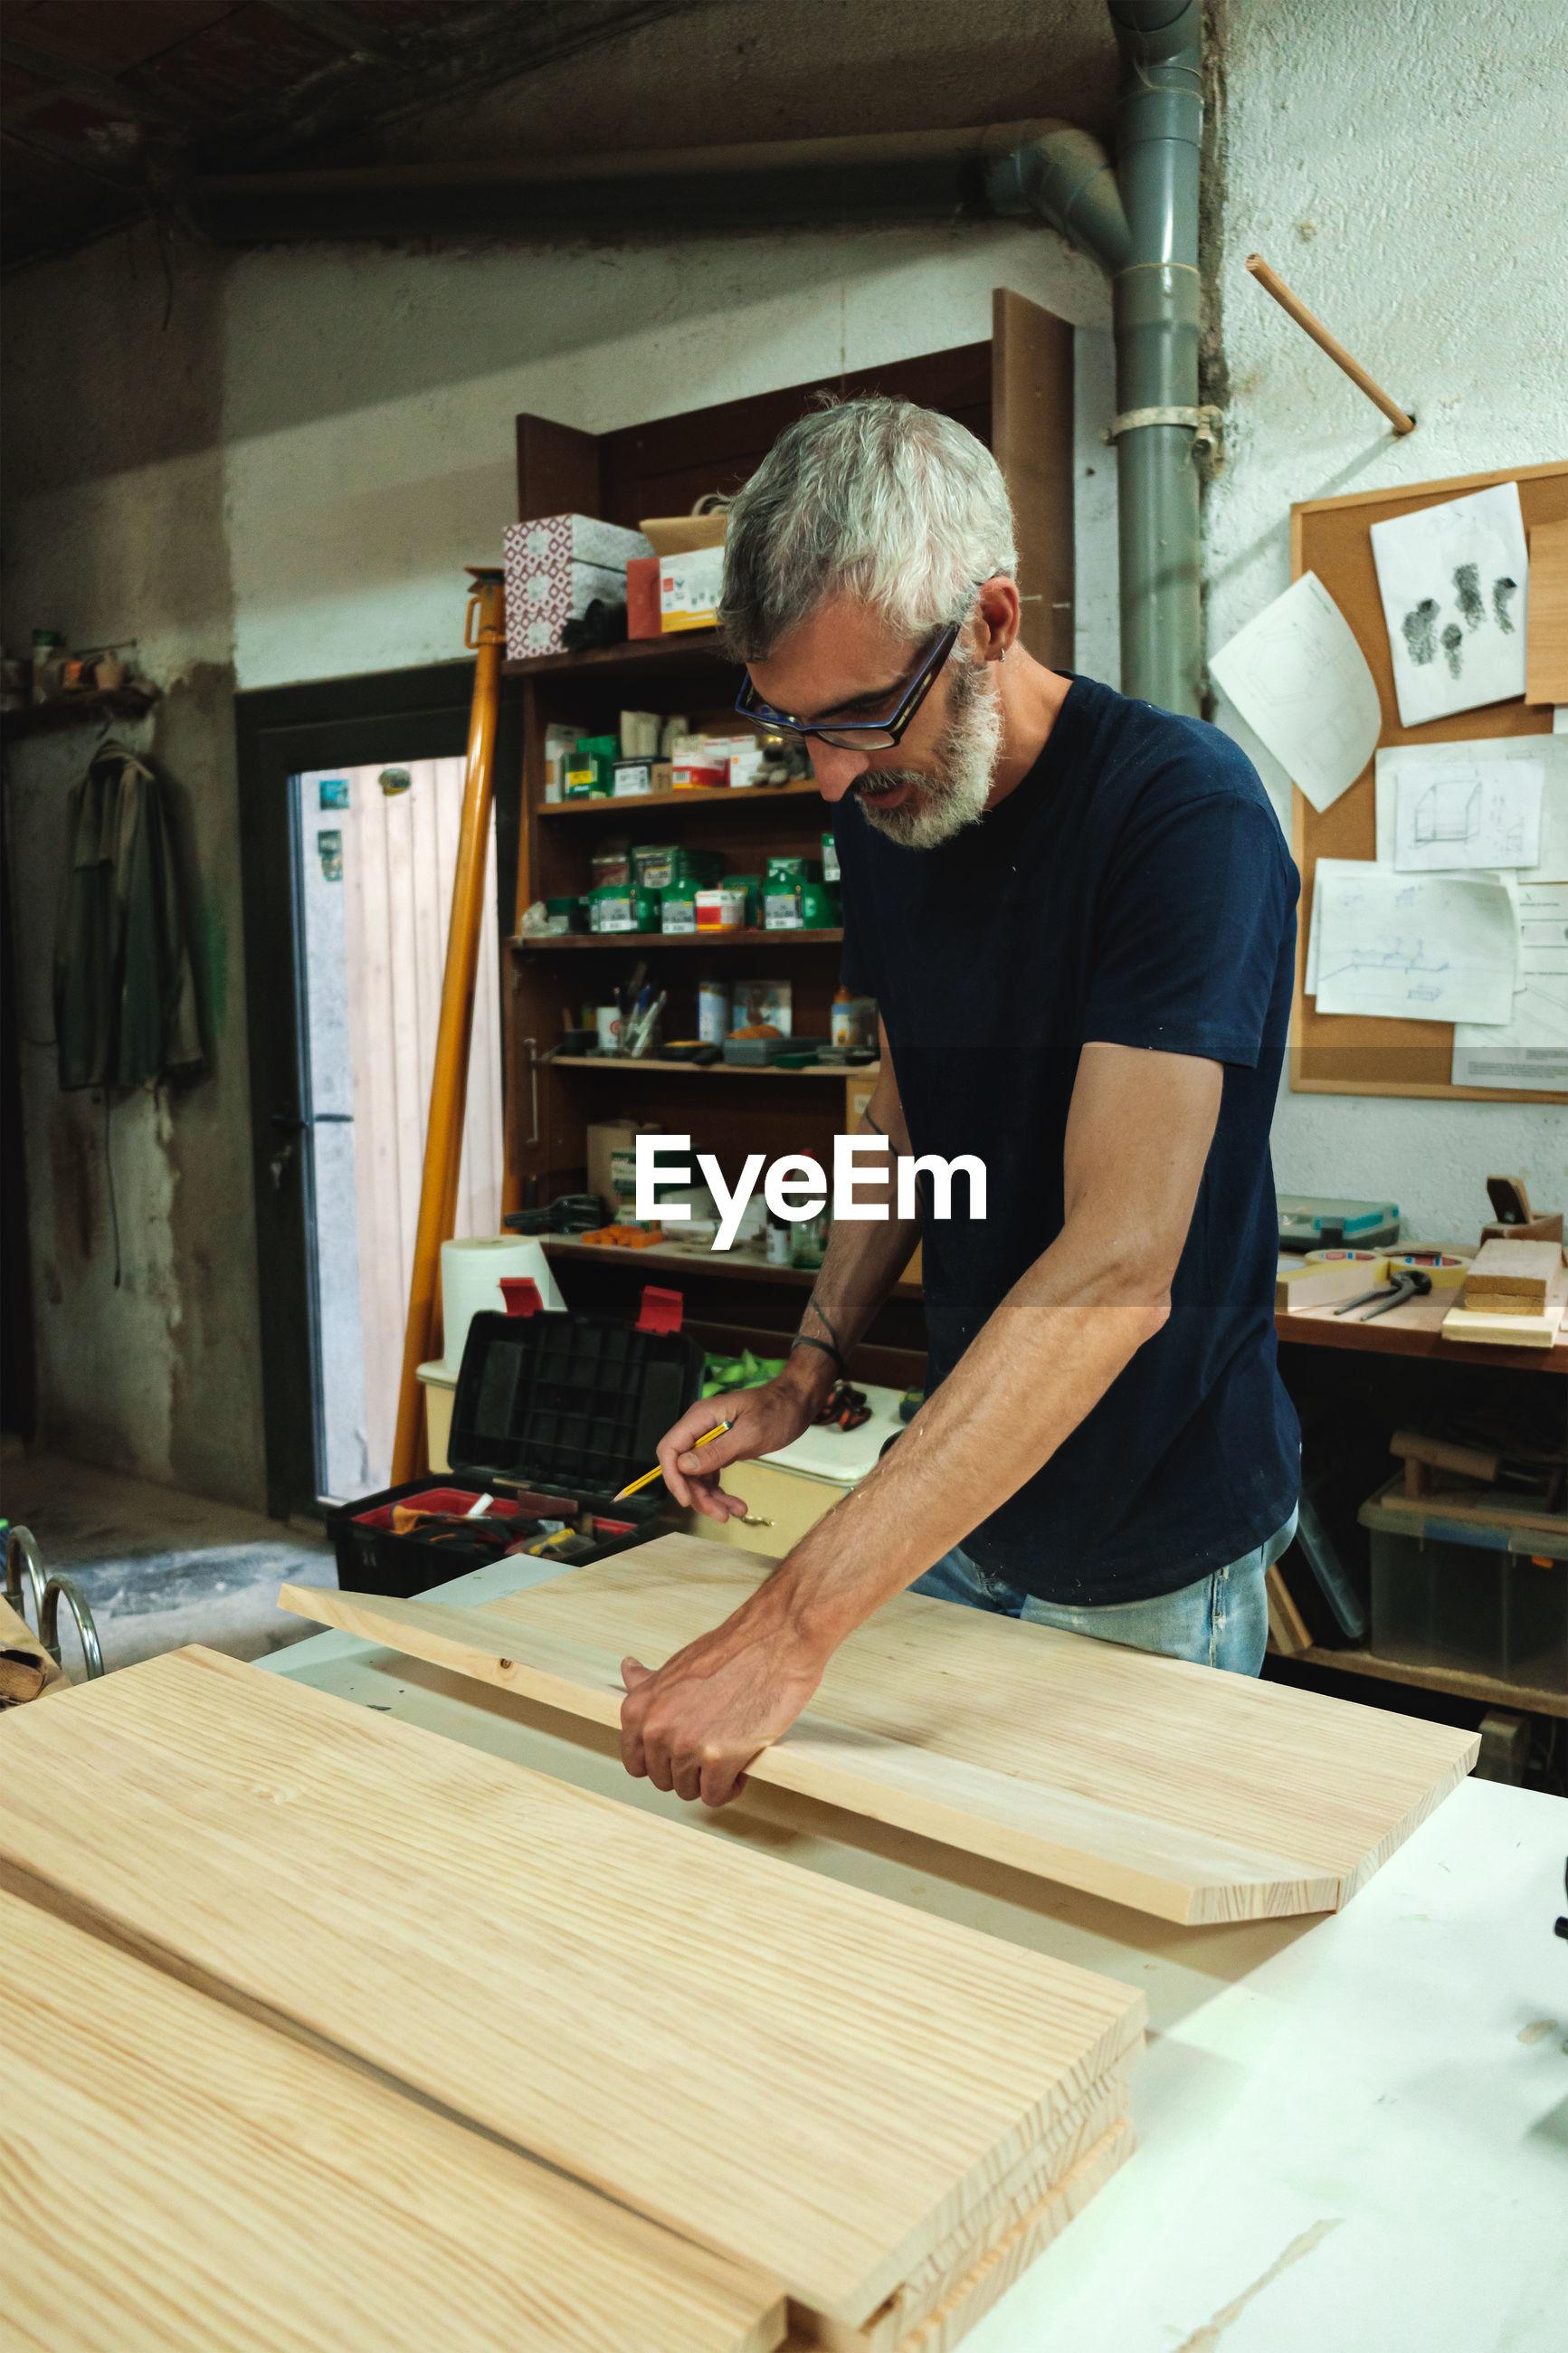 Craftsman working on wooden planks in workshop